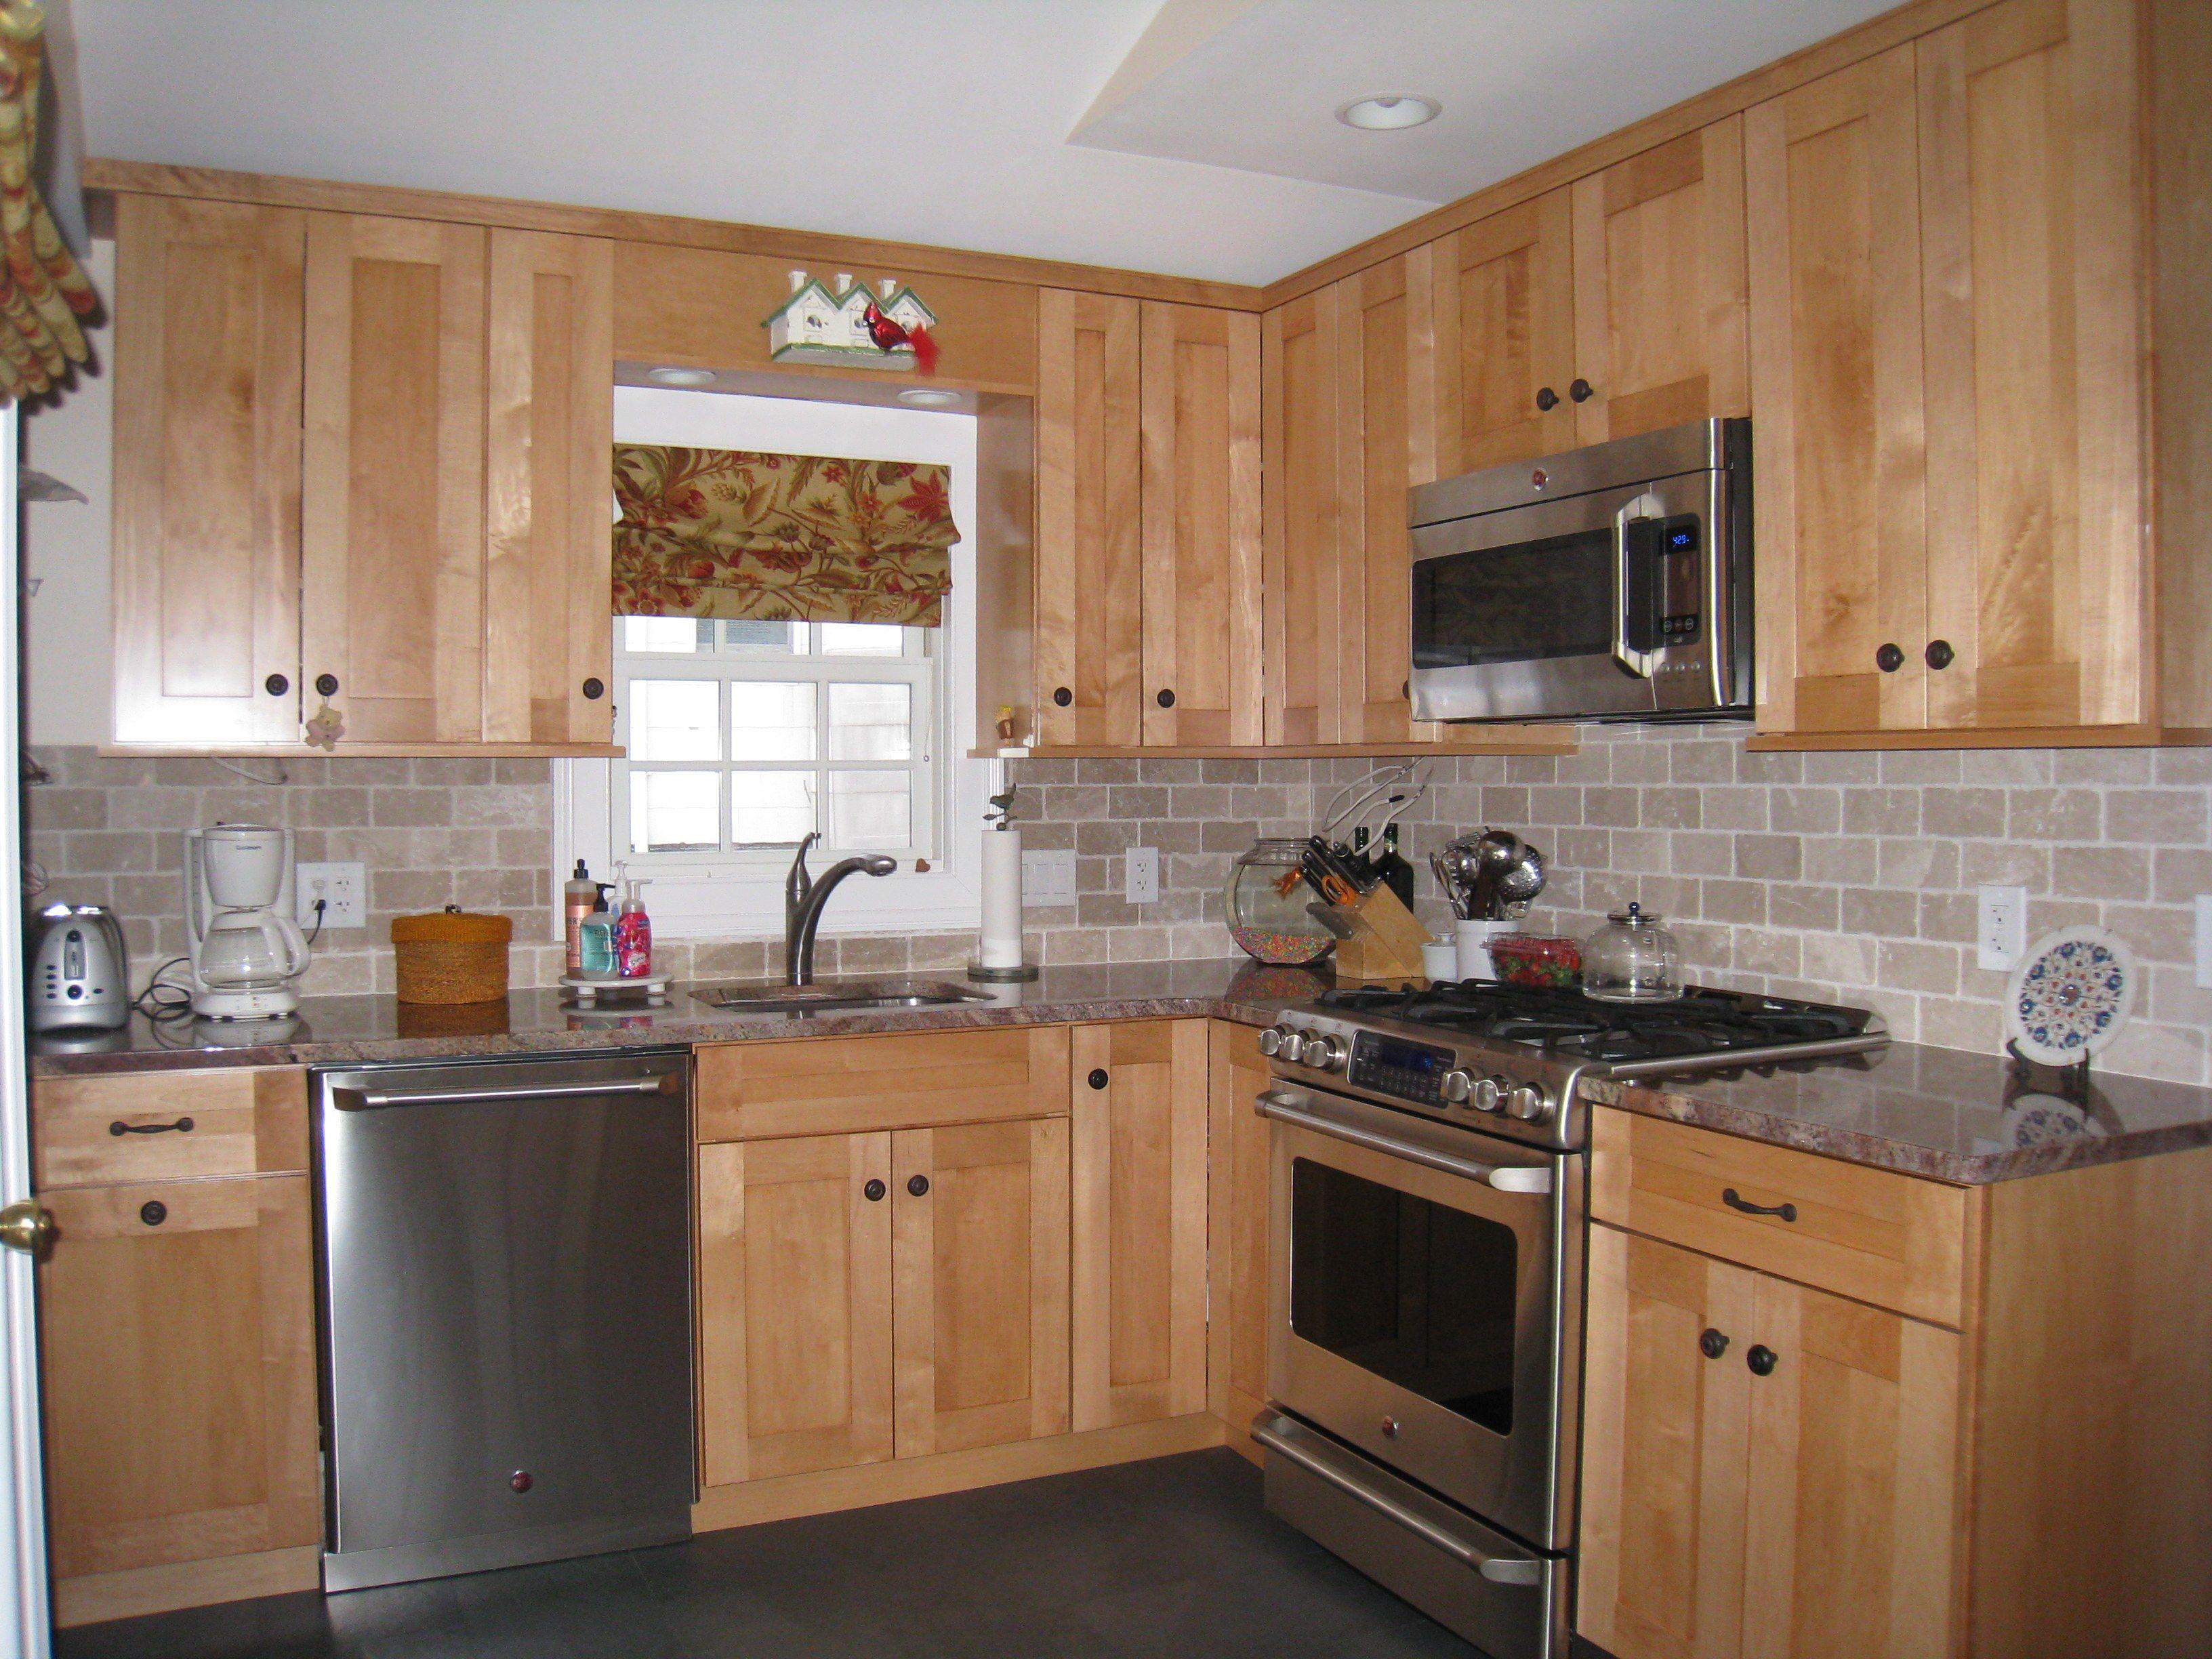 shaker style kitchen cabinets oak cabinets white subway tile windswept blue walls Shaker style maple cabinets